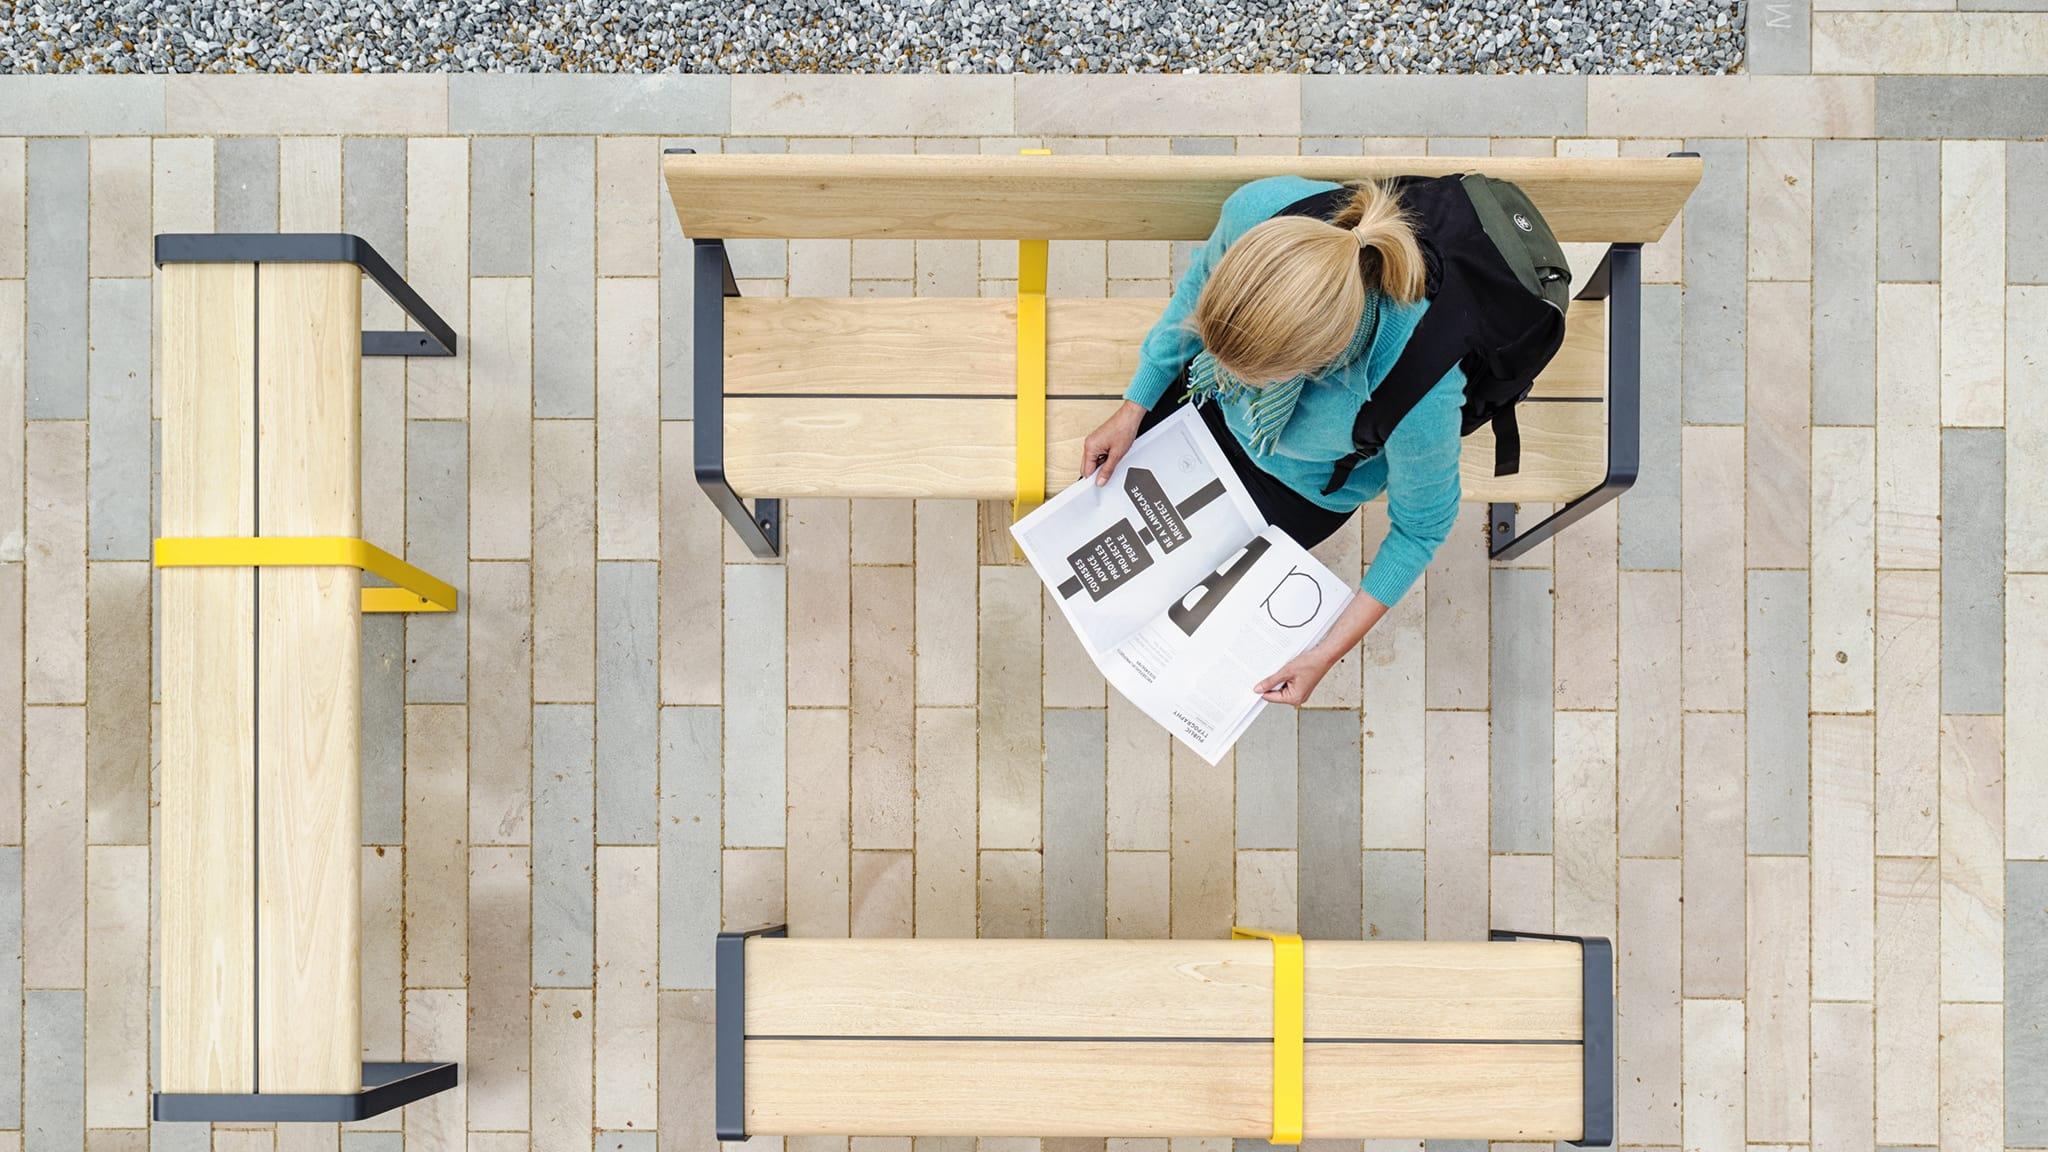 Woman reading magazine on bench